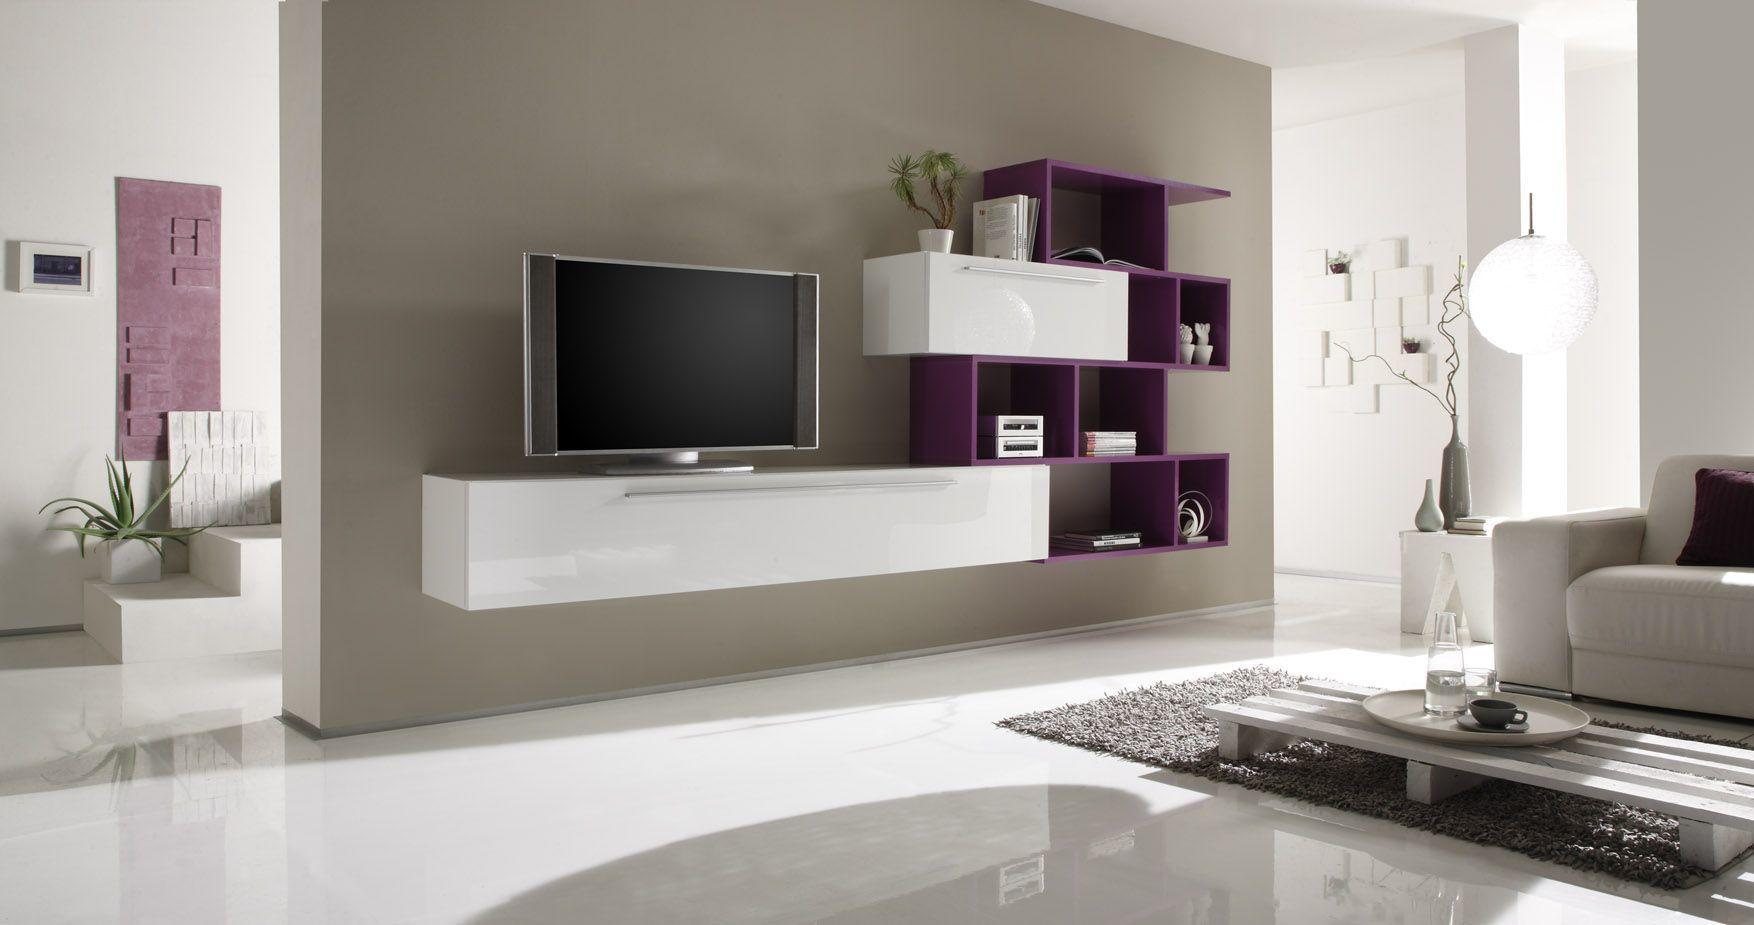 mobiletto ad angolo ikea. mobili per bagno ad angolo ikea design ... - Mobili Tv Moderni Ikea